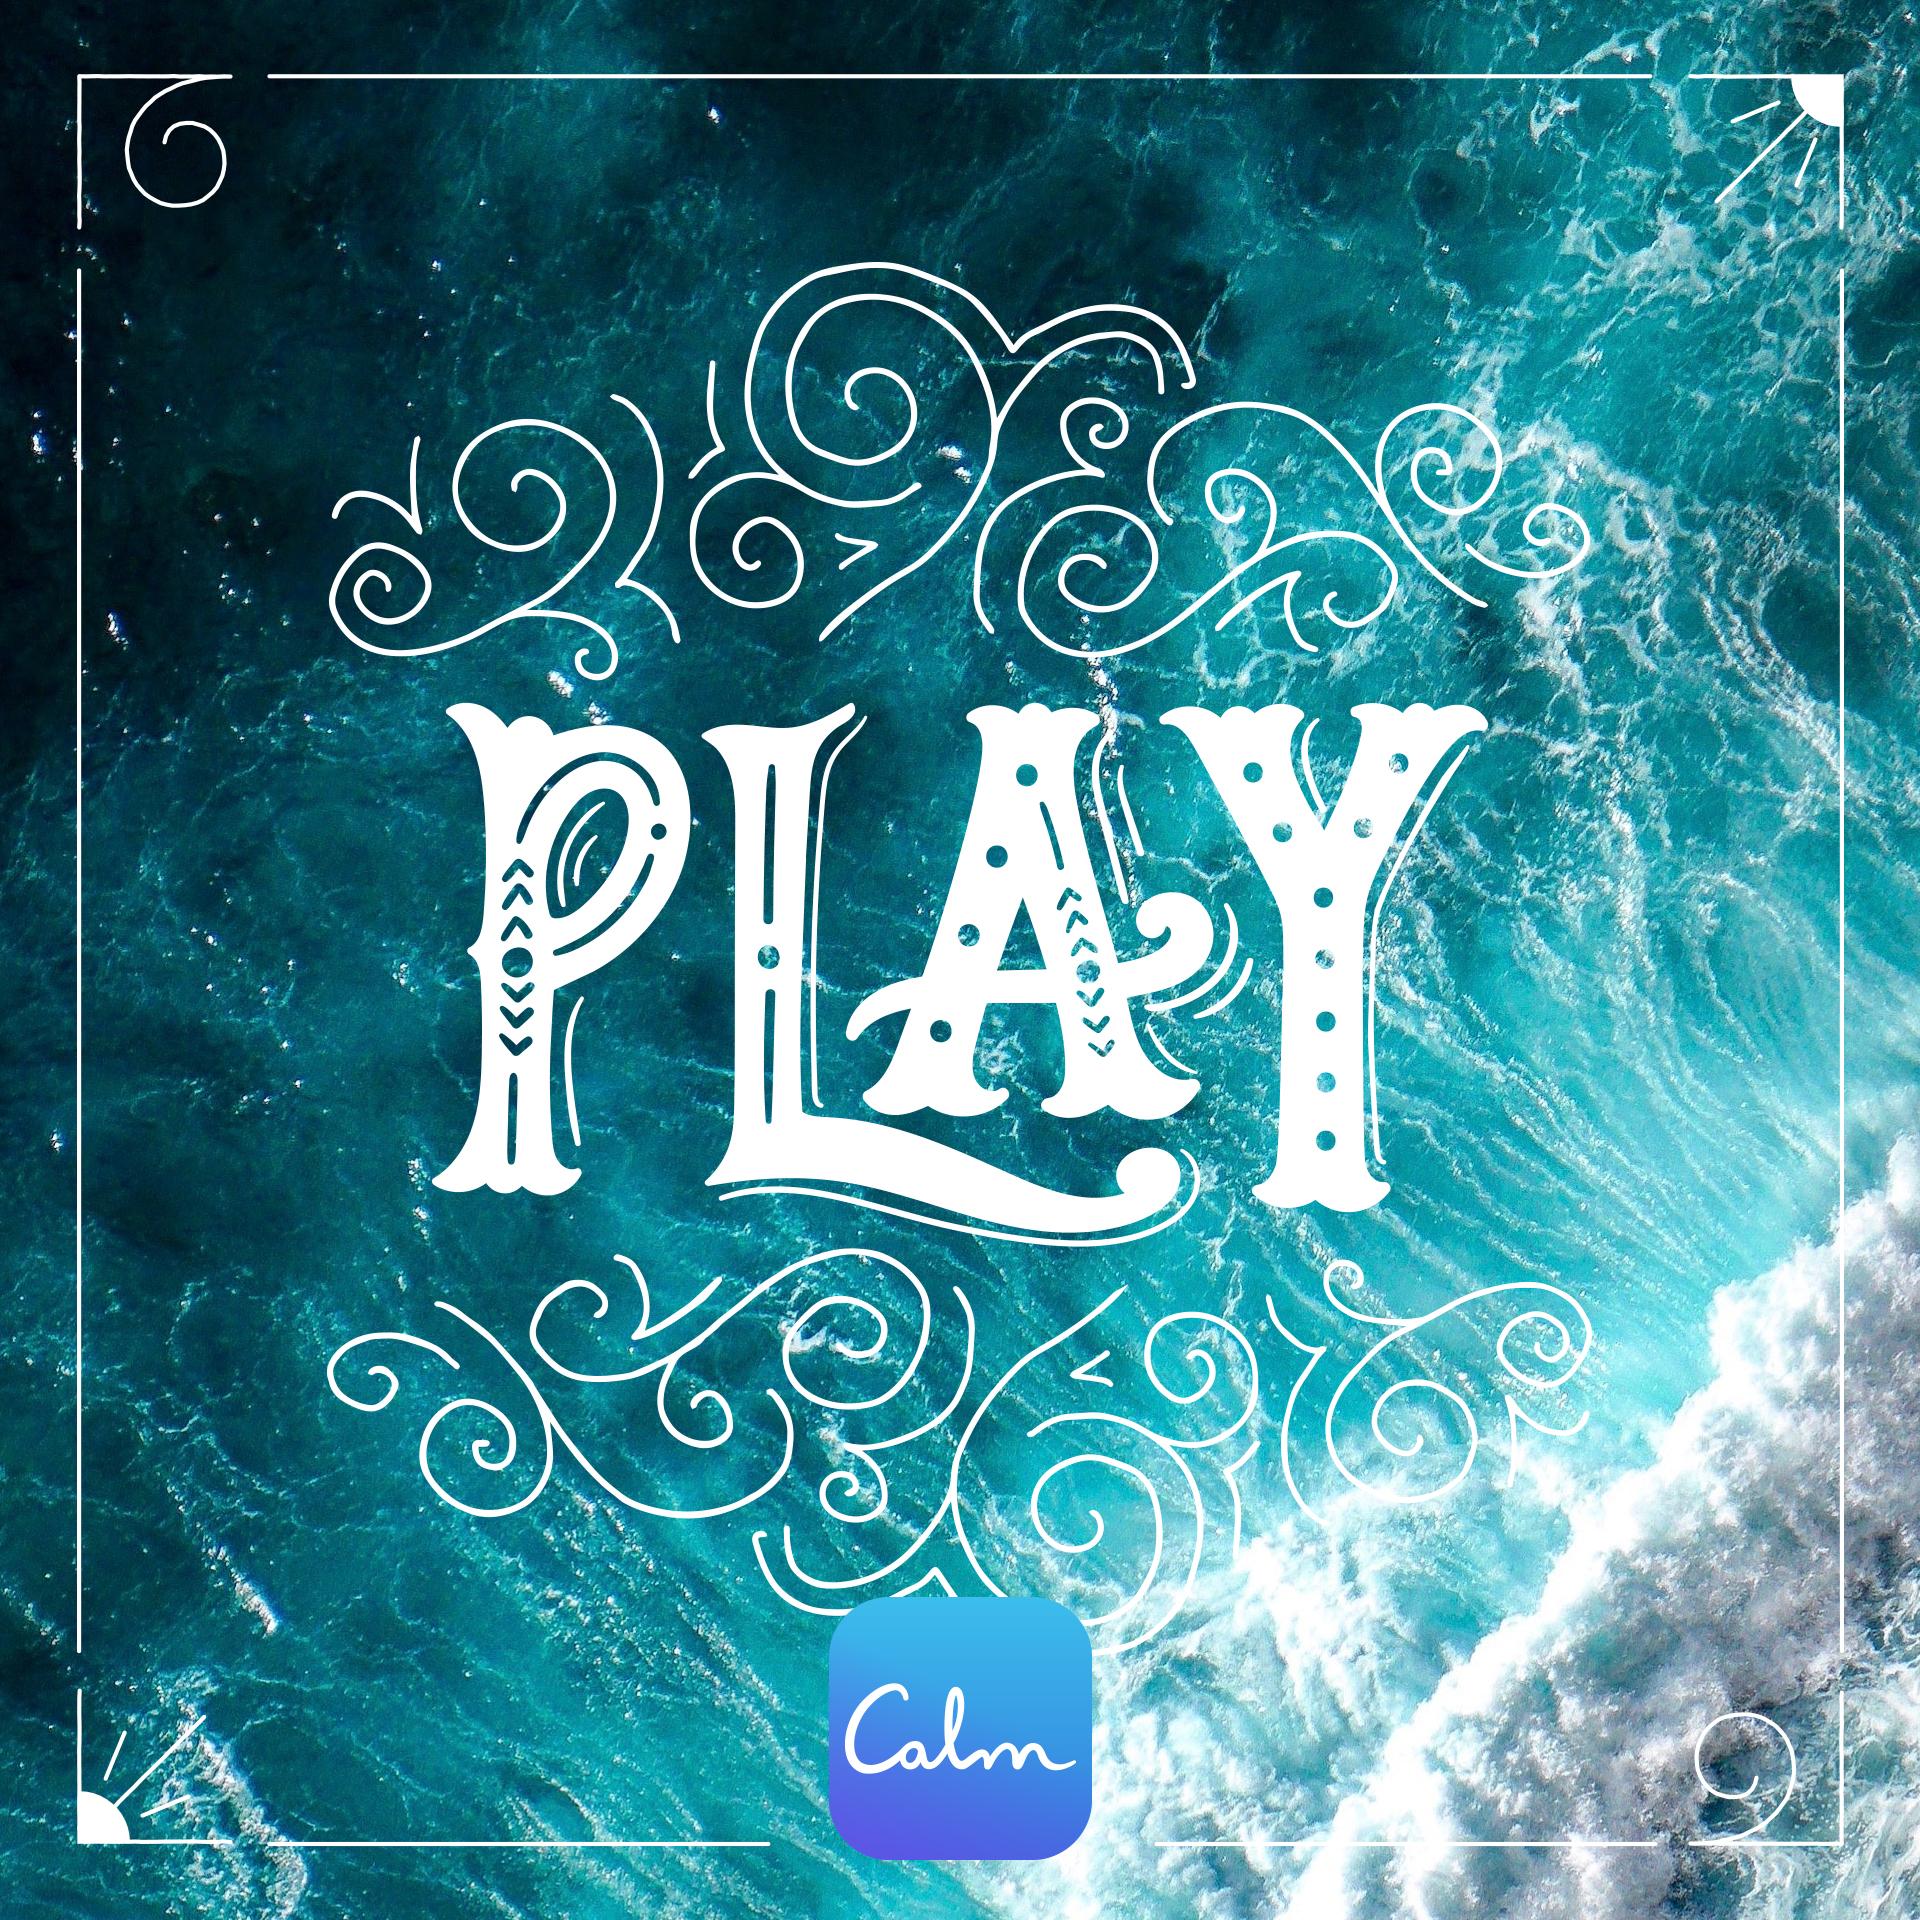 Play.jpg